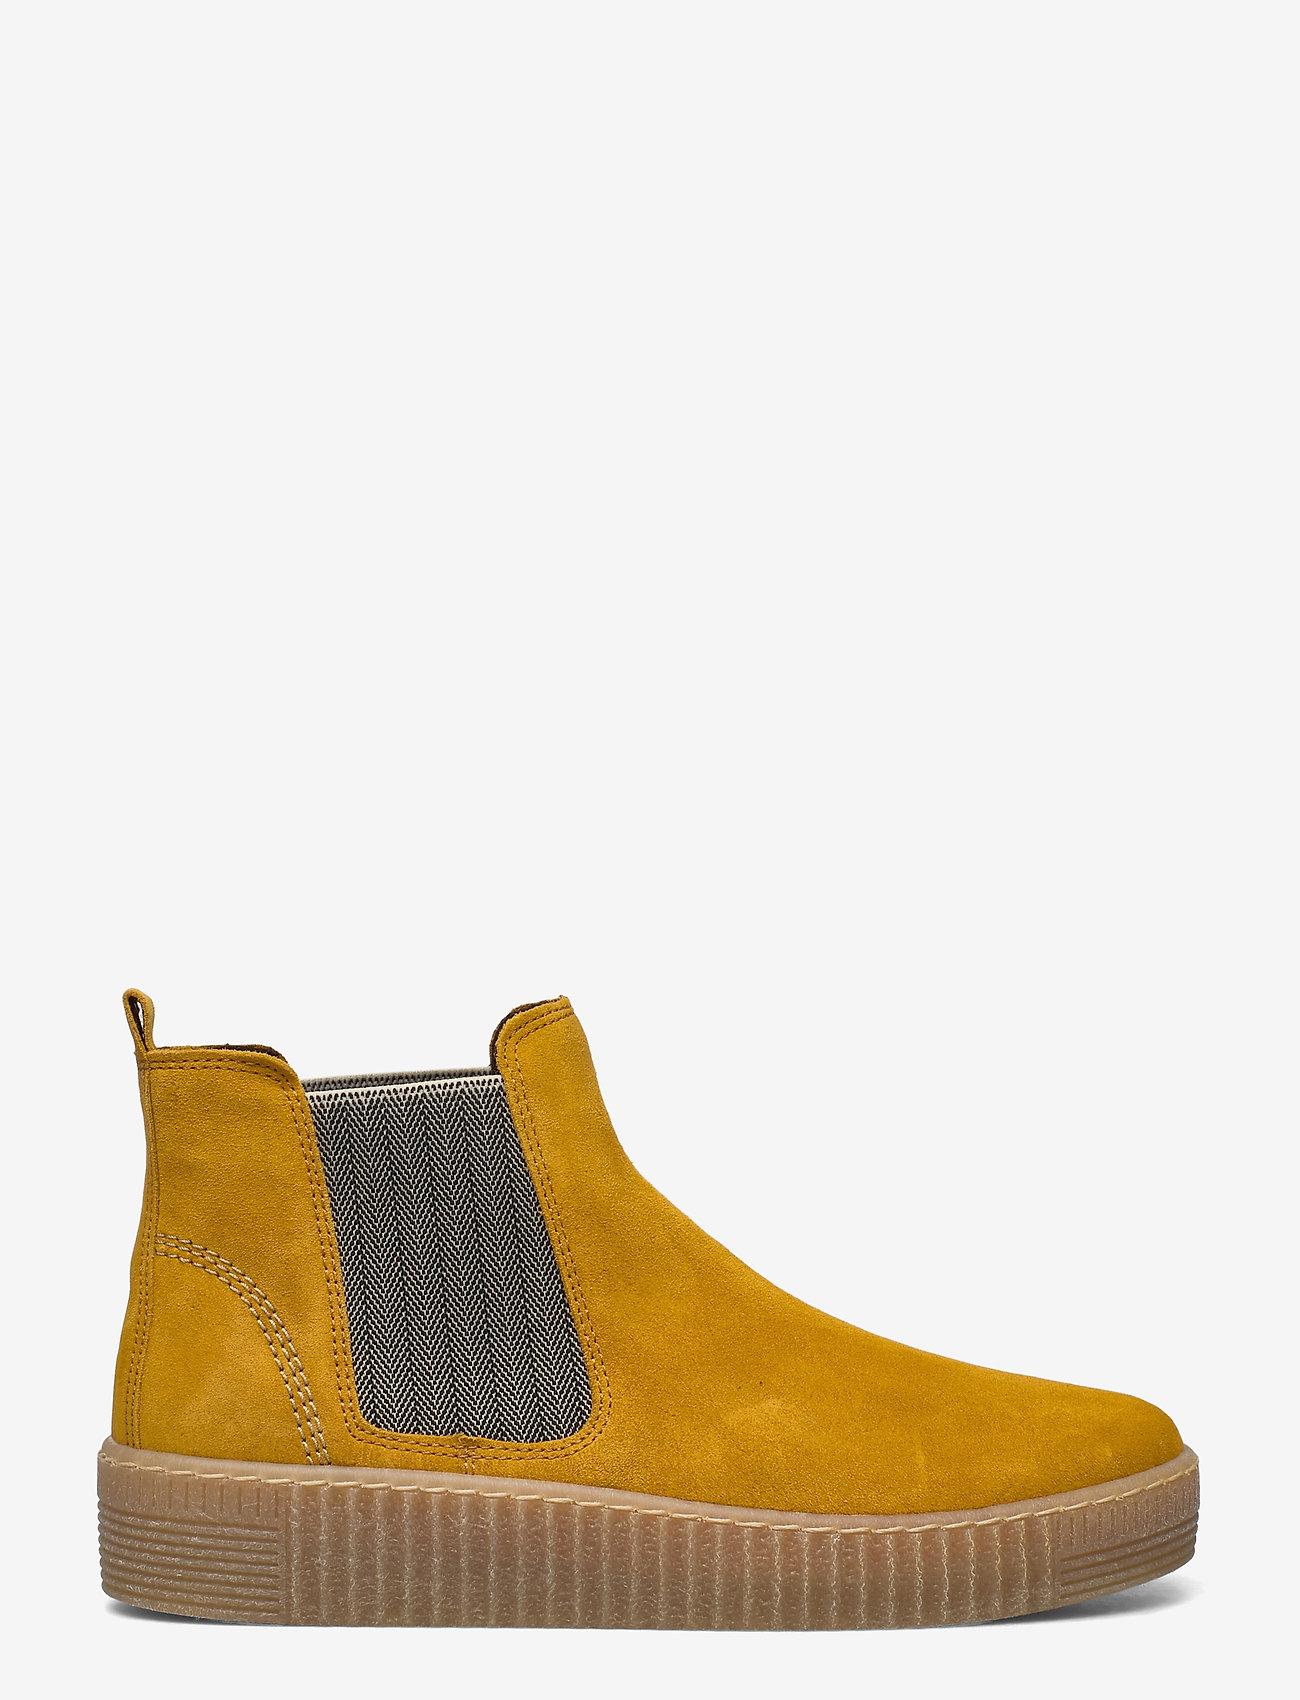 Gabor - Ankle boot - niski obcas - multi color - 1